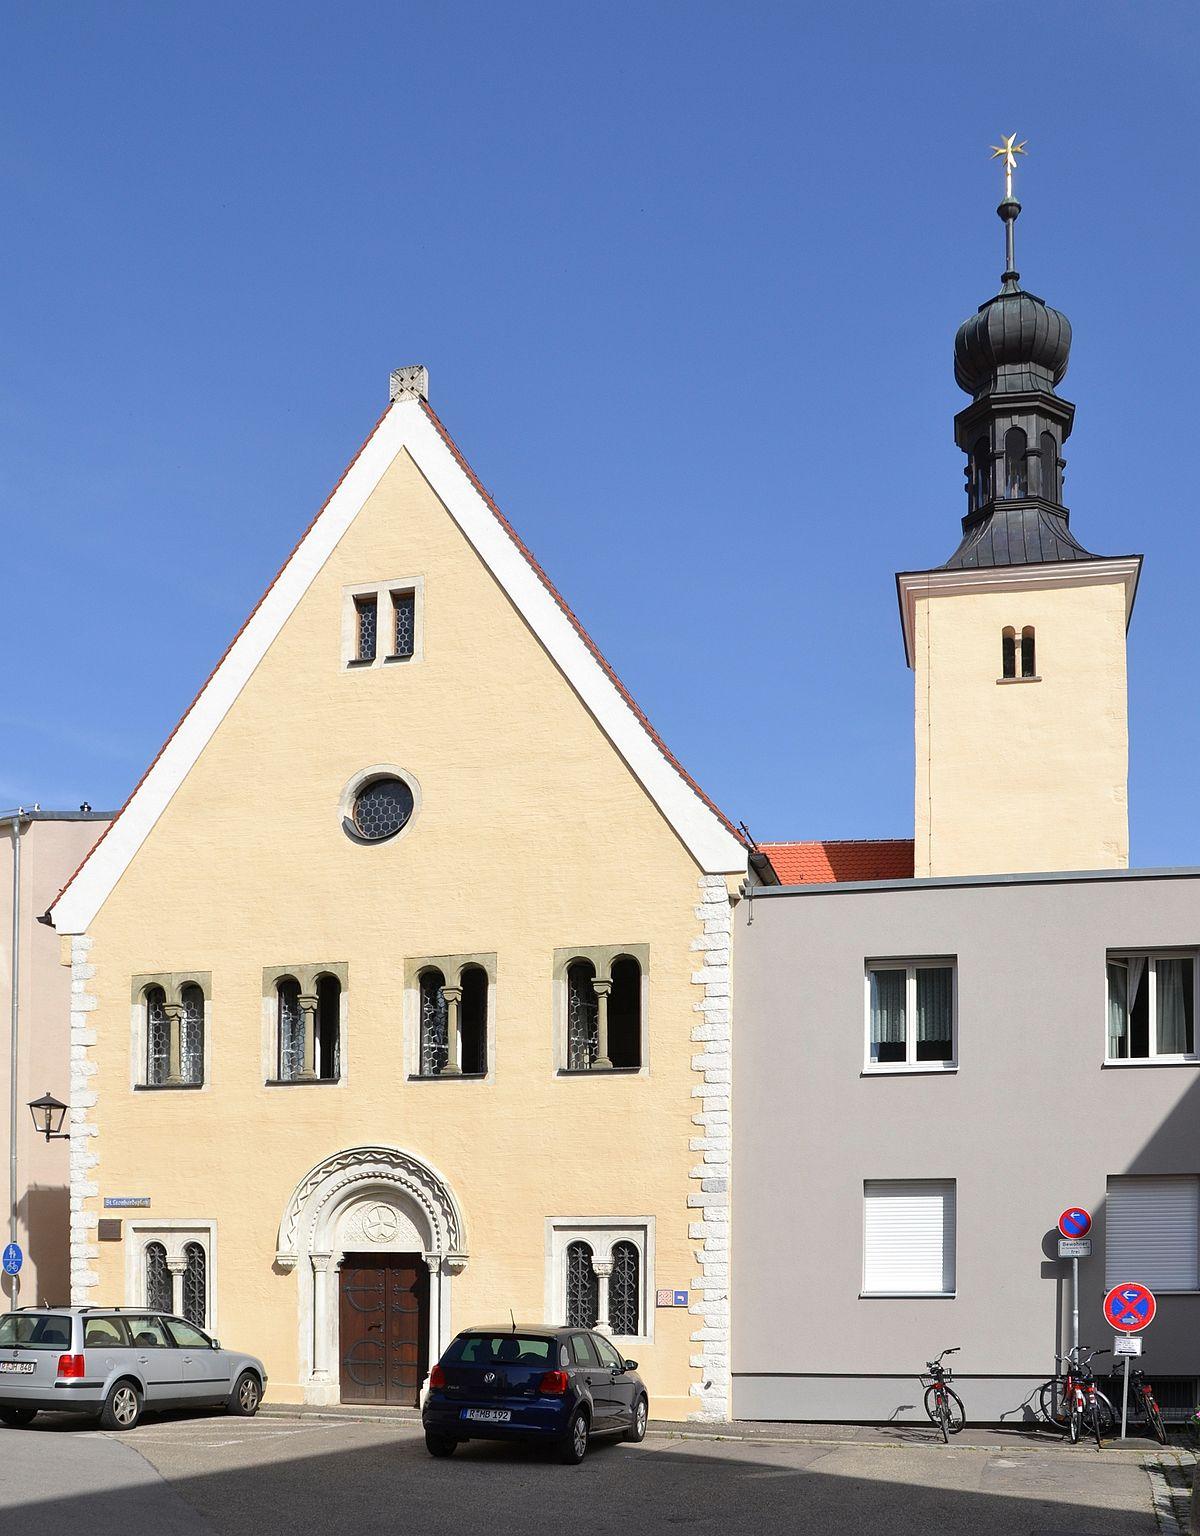 St. Leonhard Regensburg